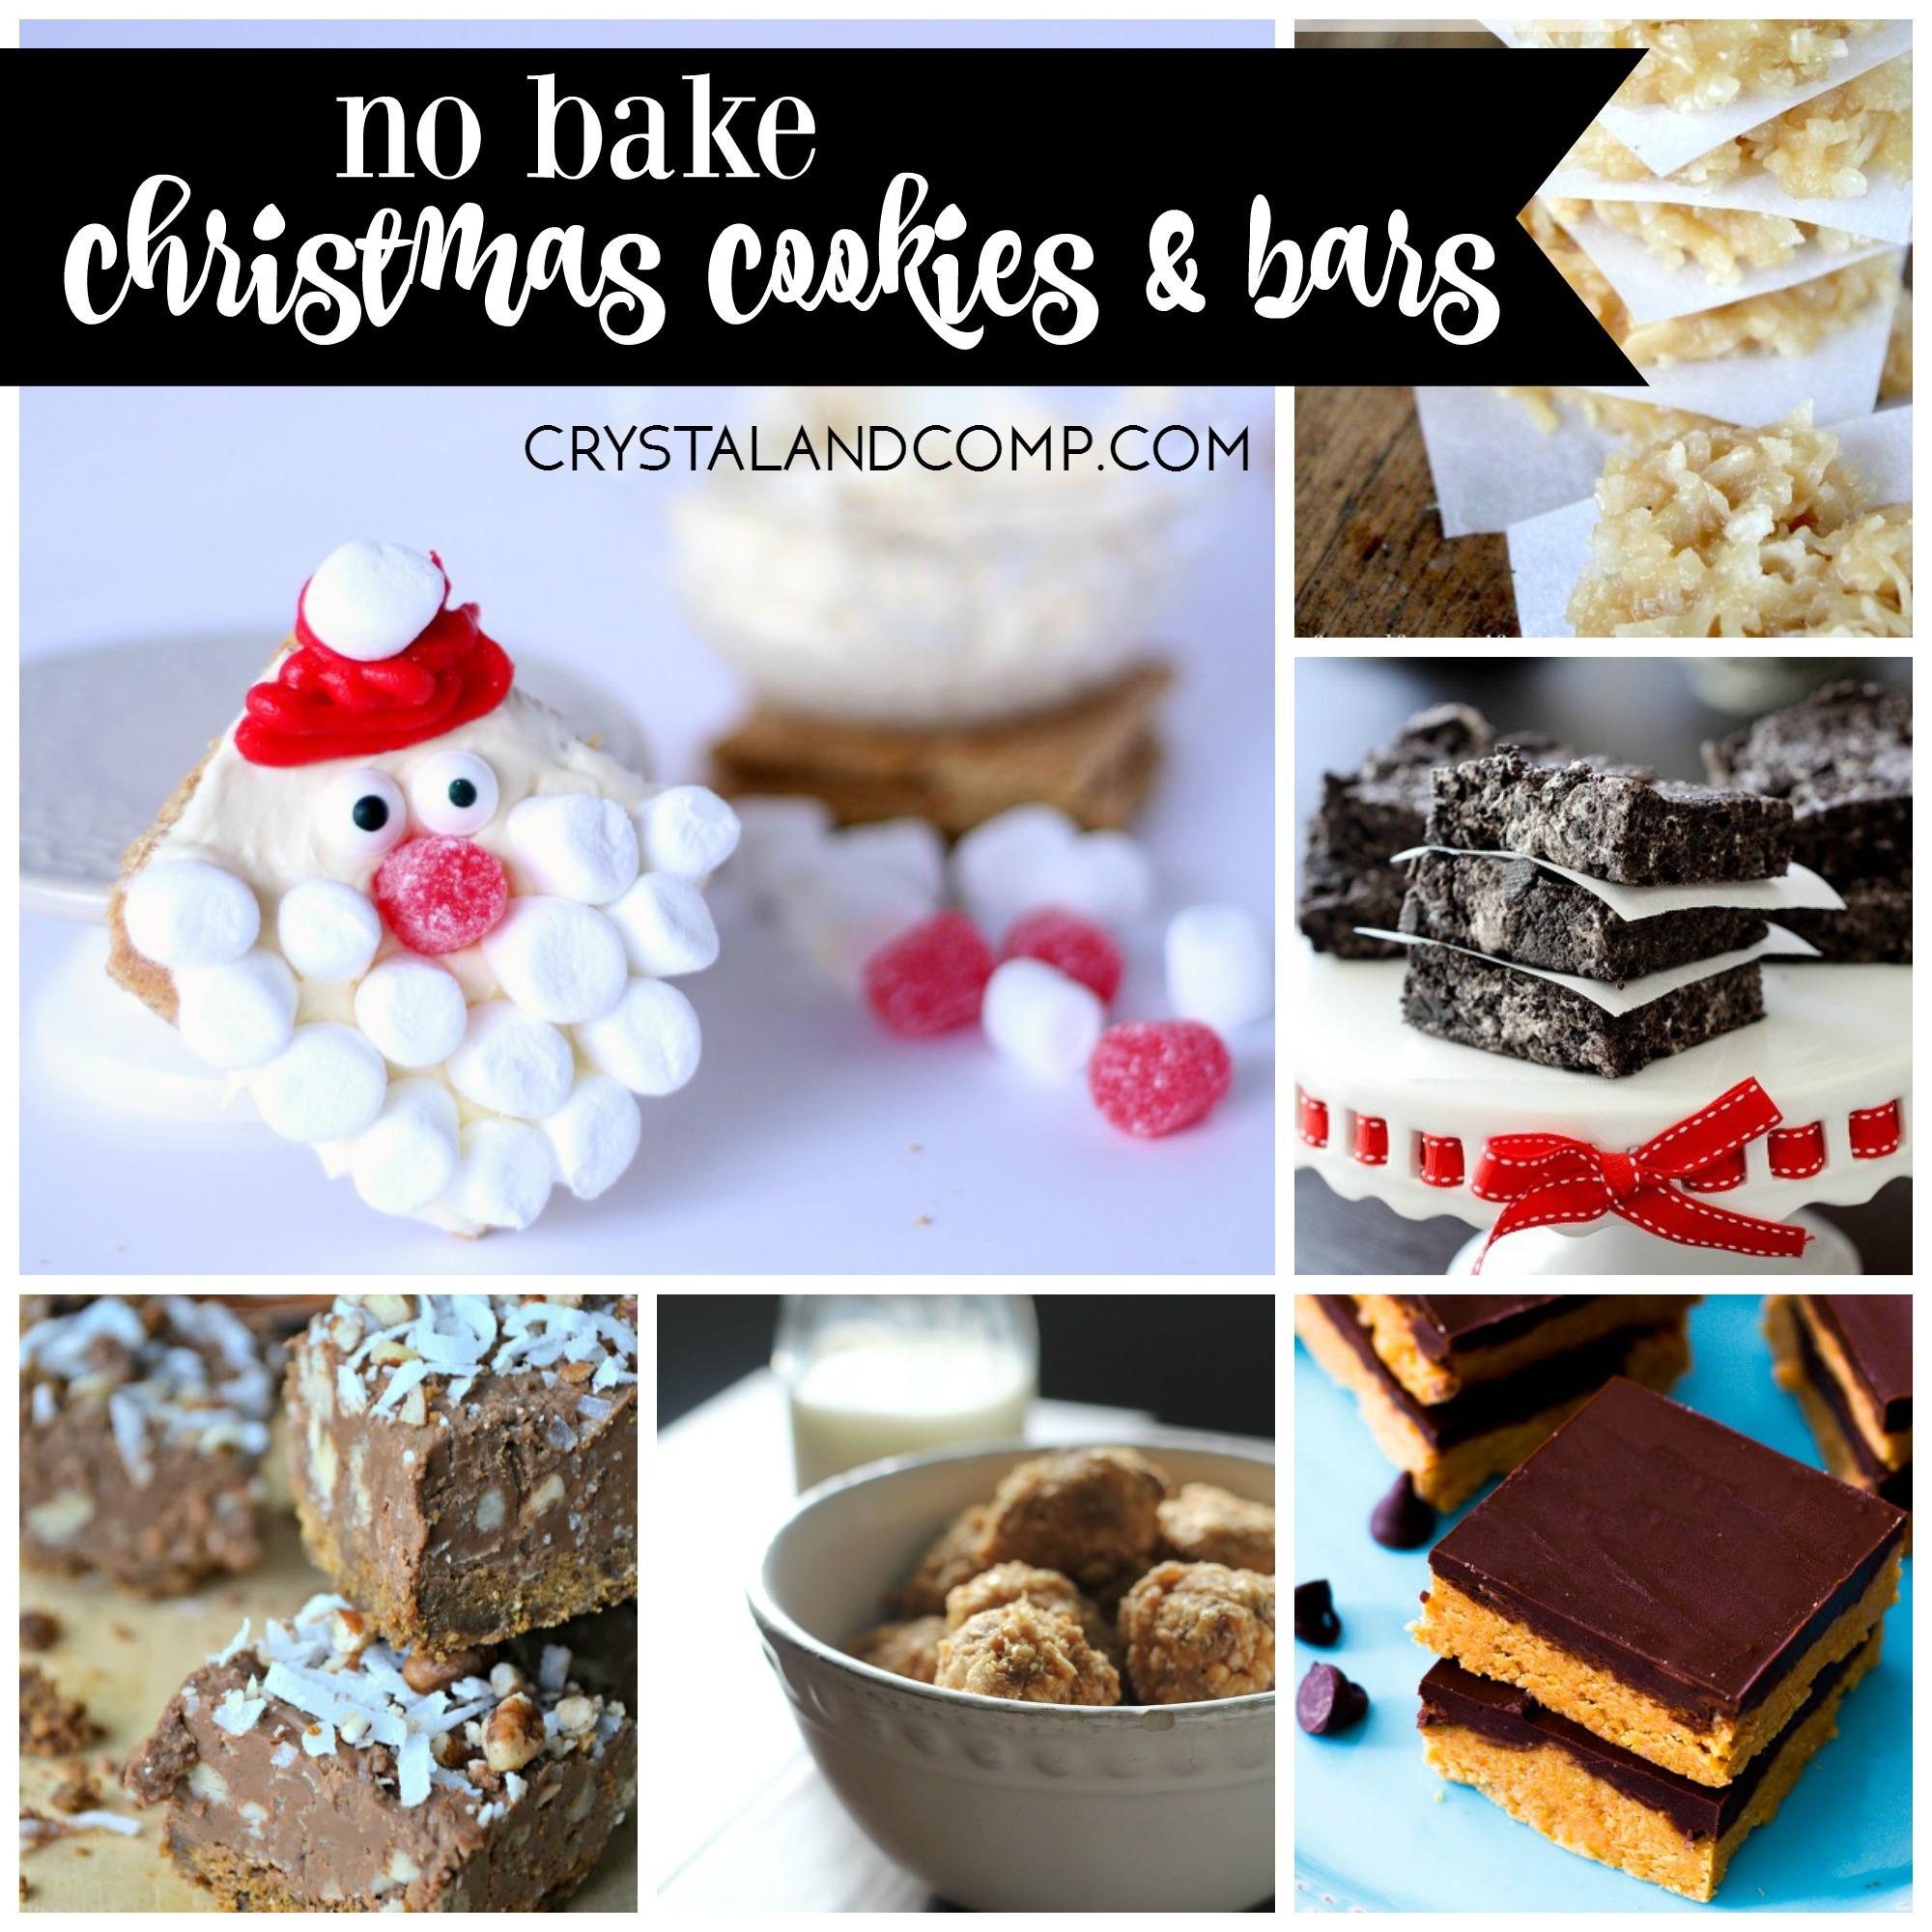 27 Irresistible No Bake Cookies and Bars For Christmas ...